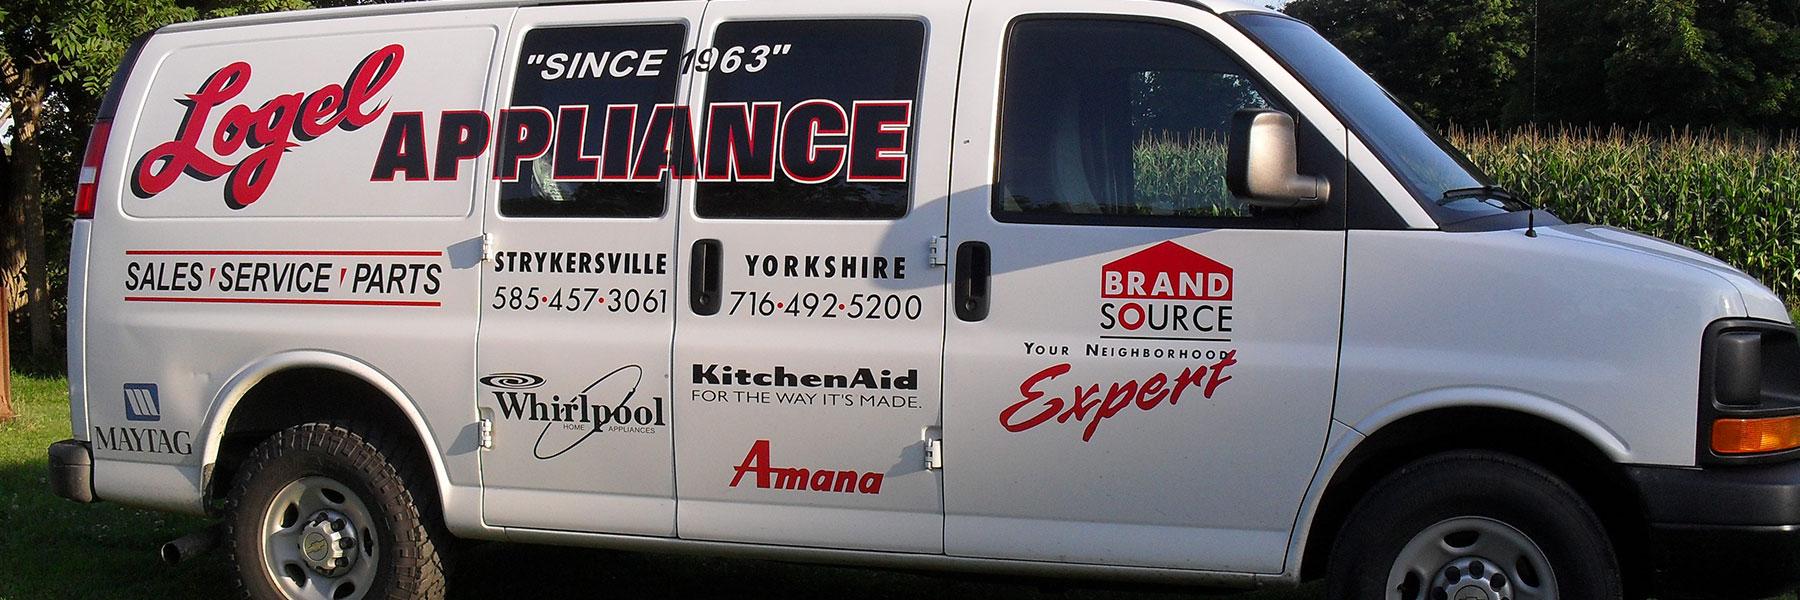 About Logel Appliance